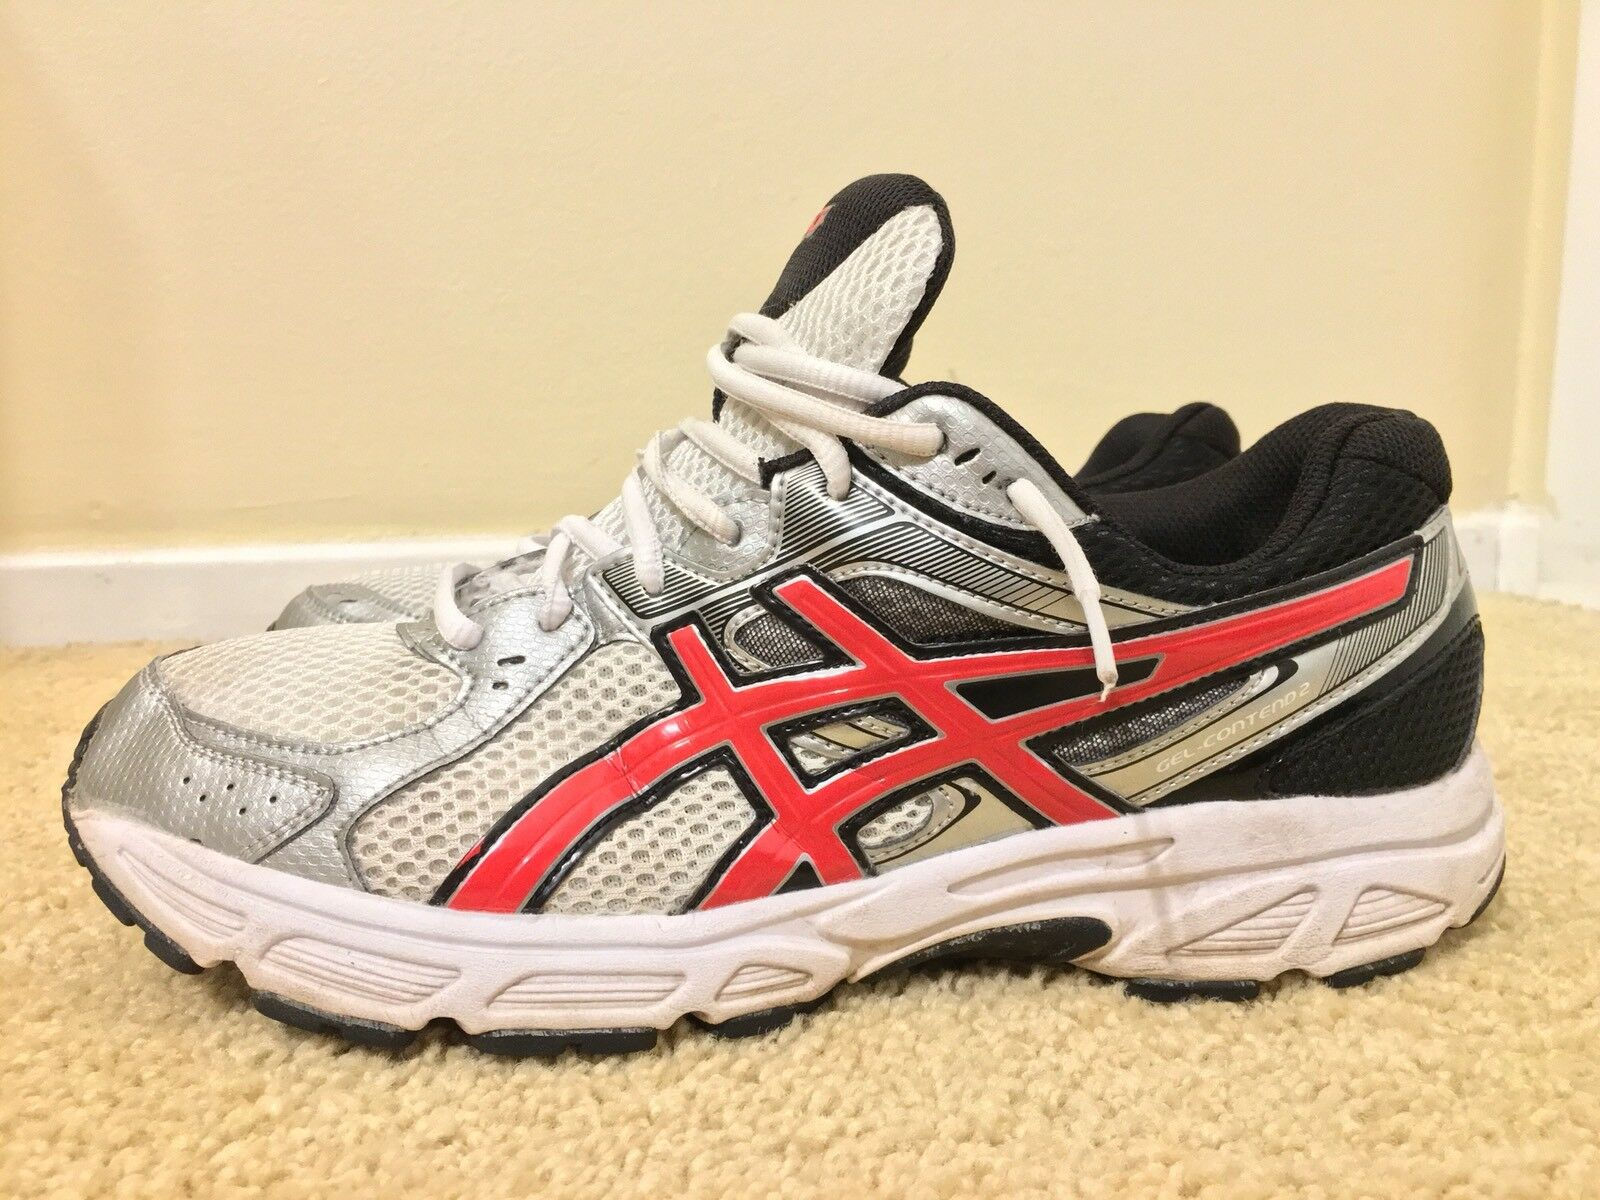 Asics Gel-Contend 2, T426N, Blanc/Noir, Homme Running Chaussures,